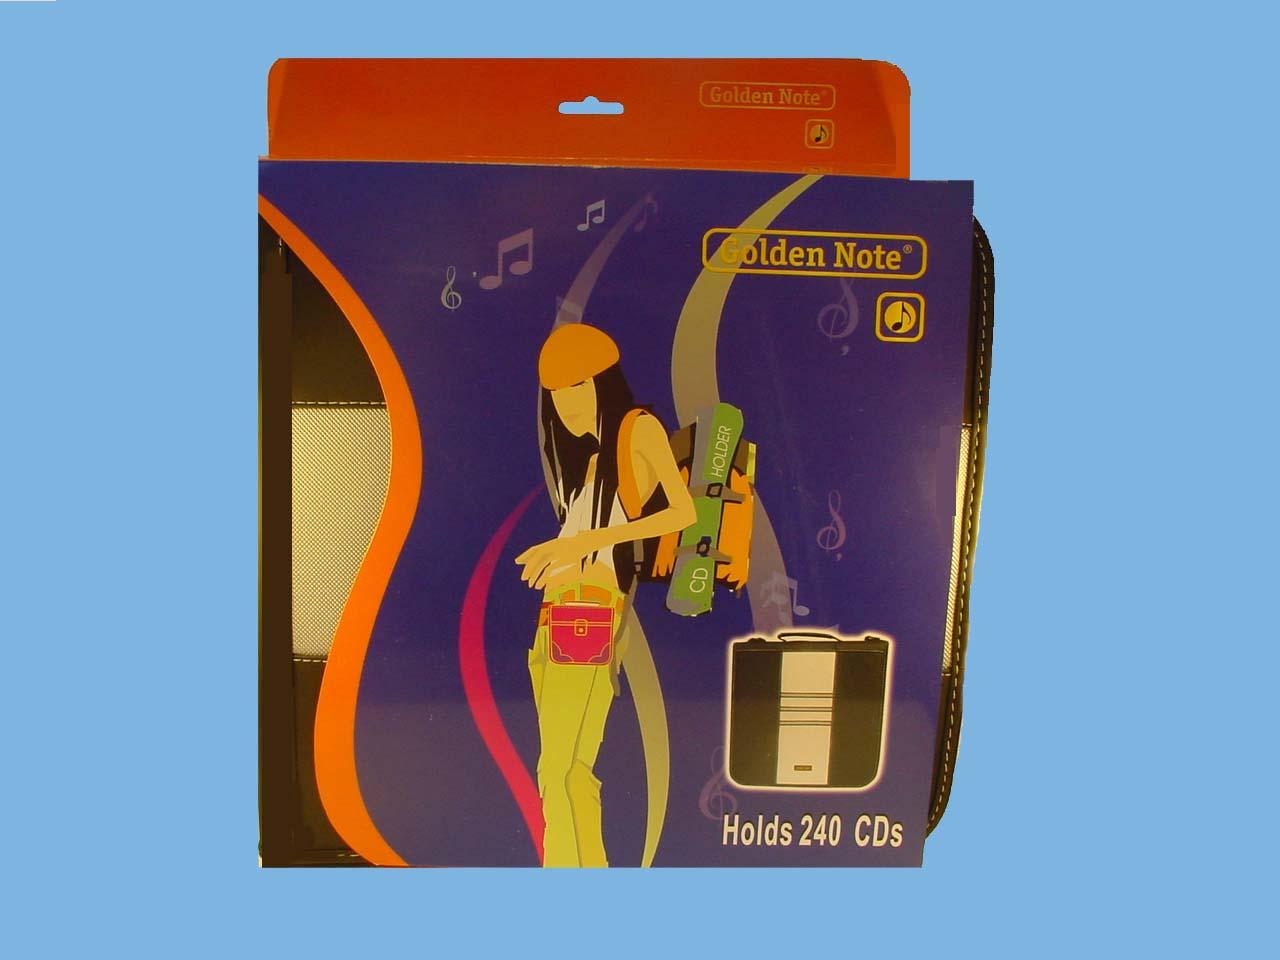 CD wallet 240 cd's